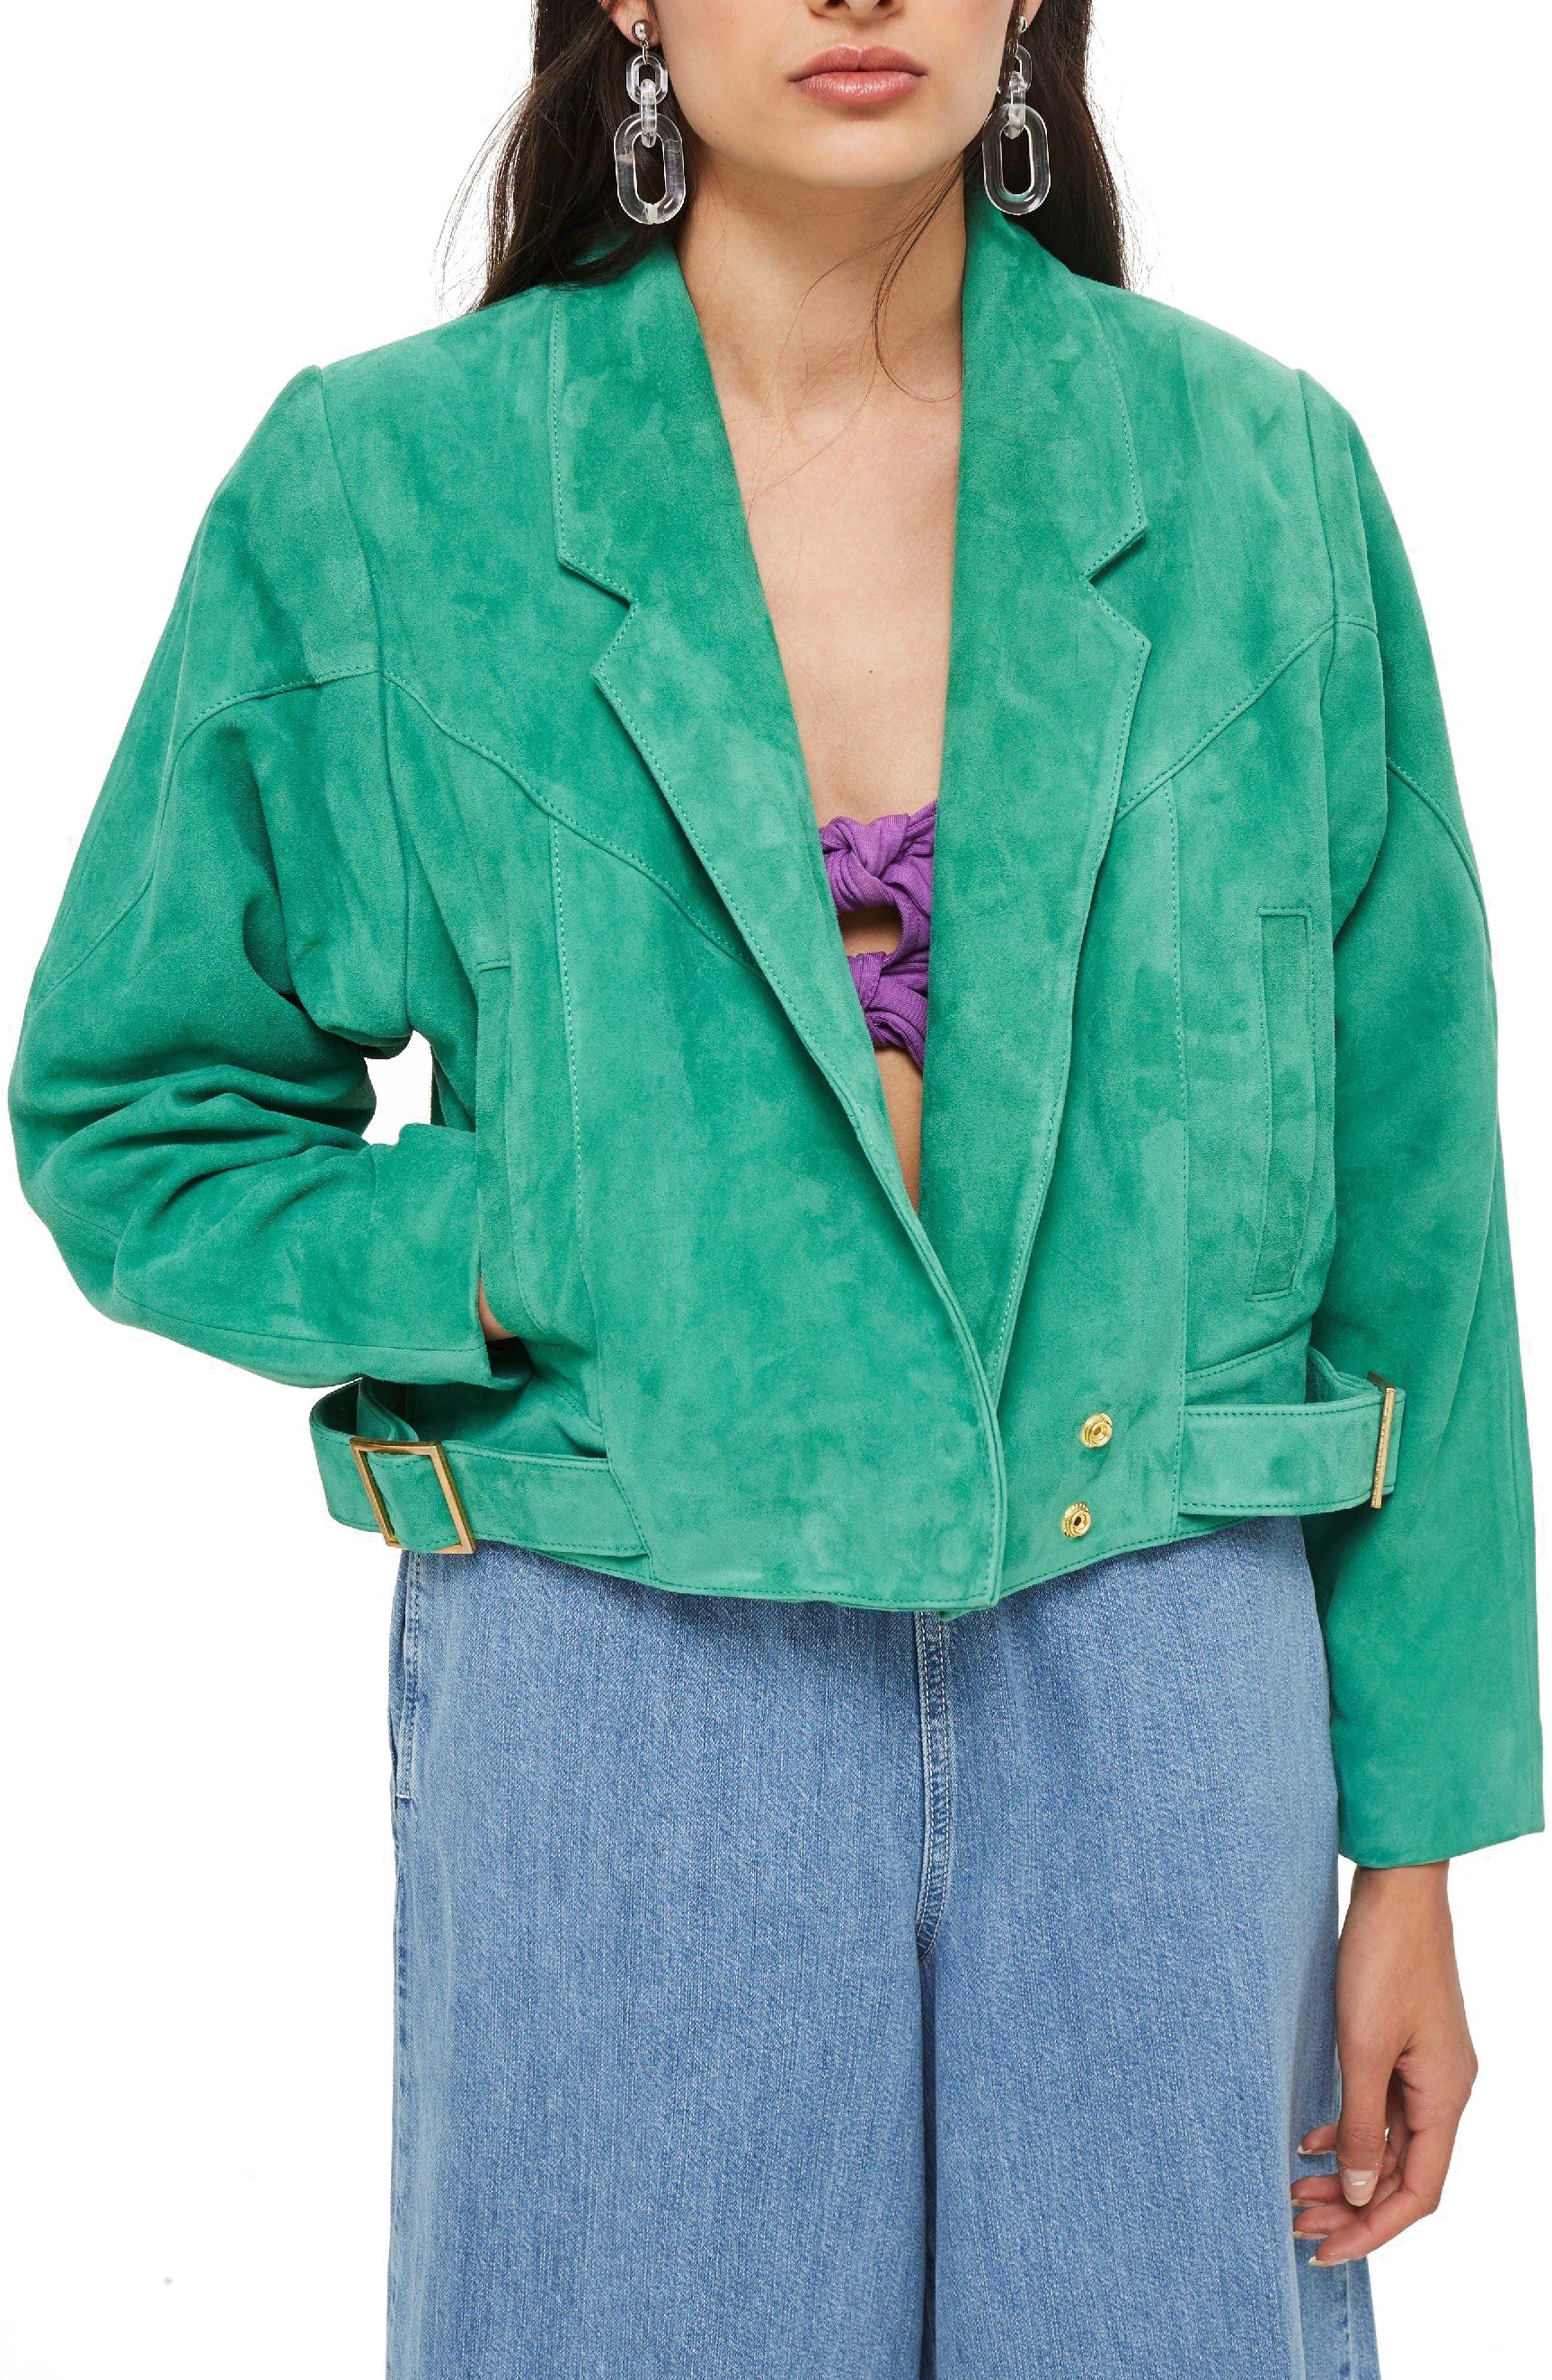 Hawkes Suede Jacket,                             Main thumbnail 1, color,                             300